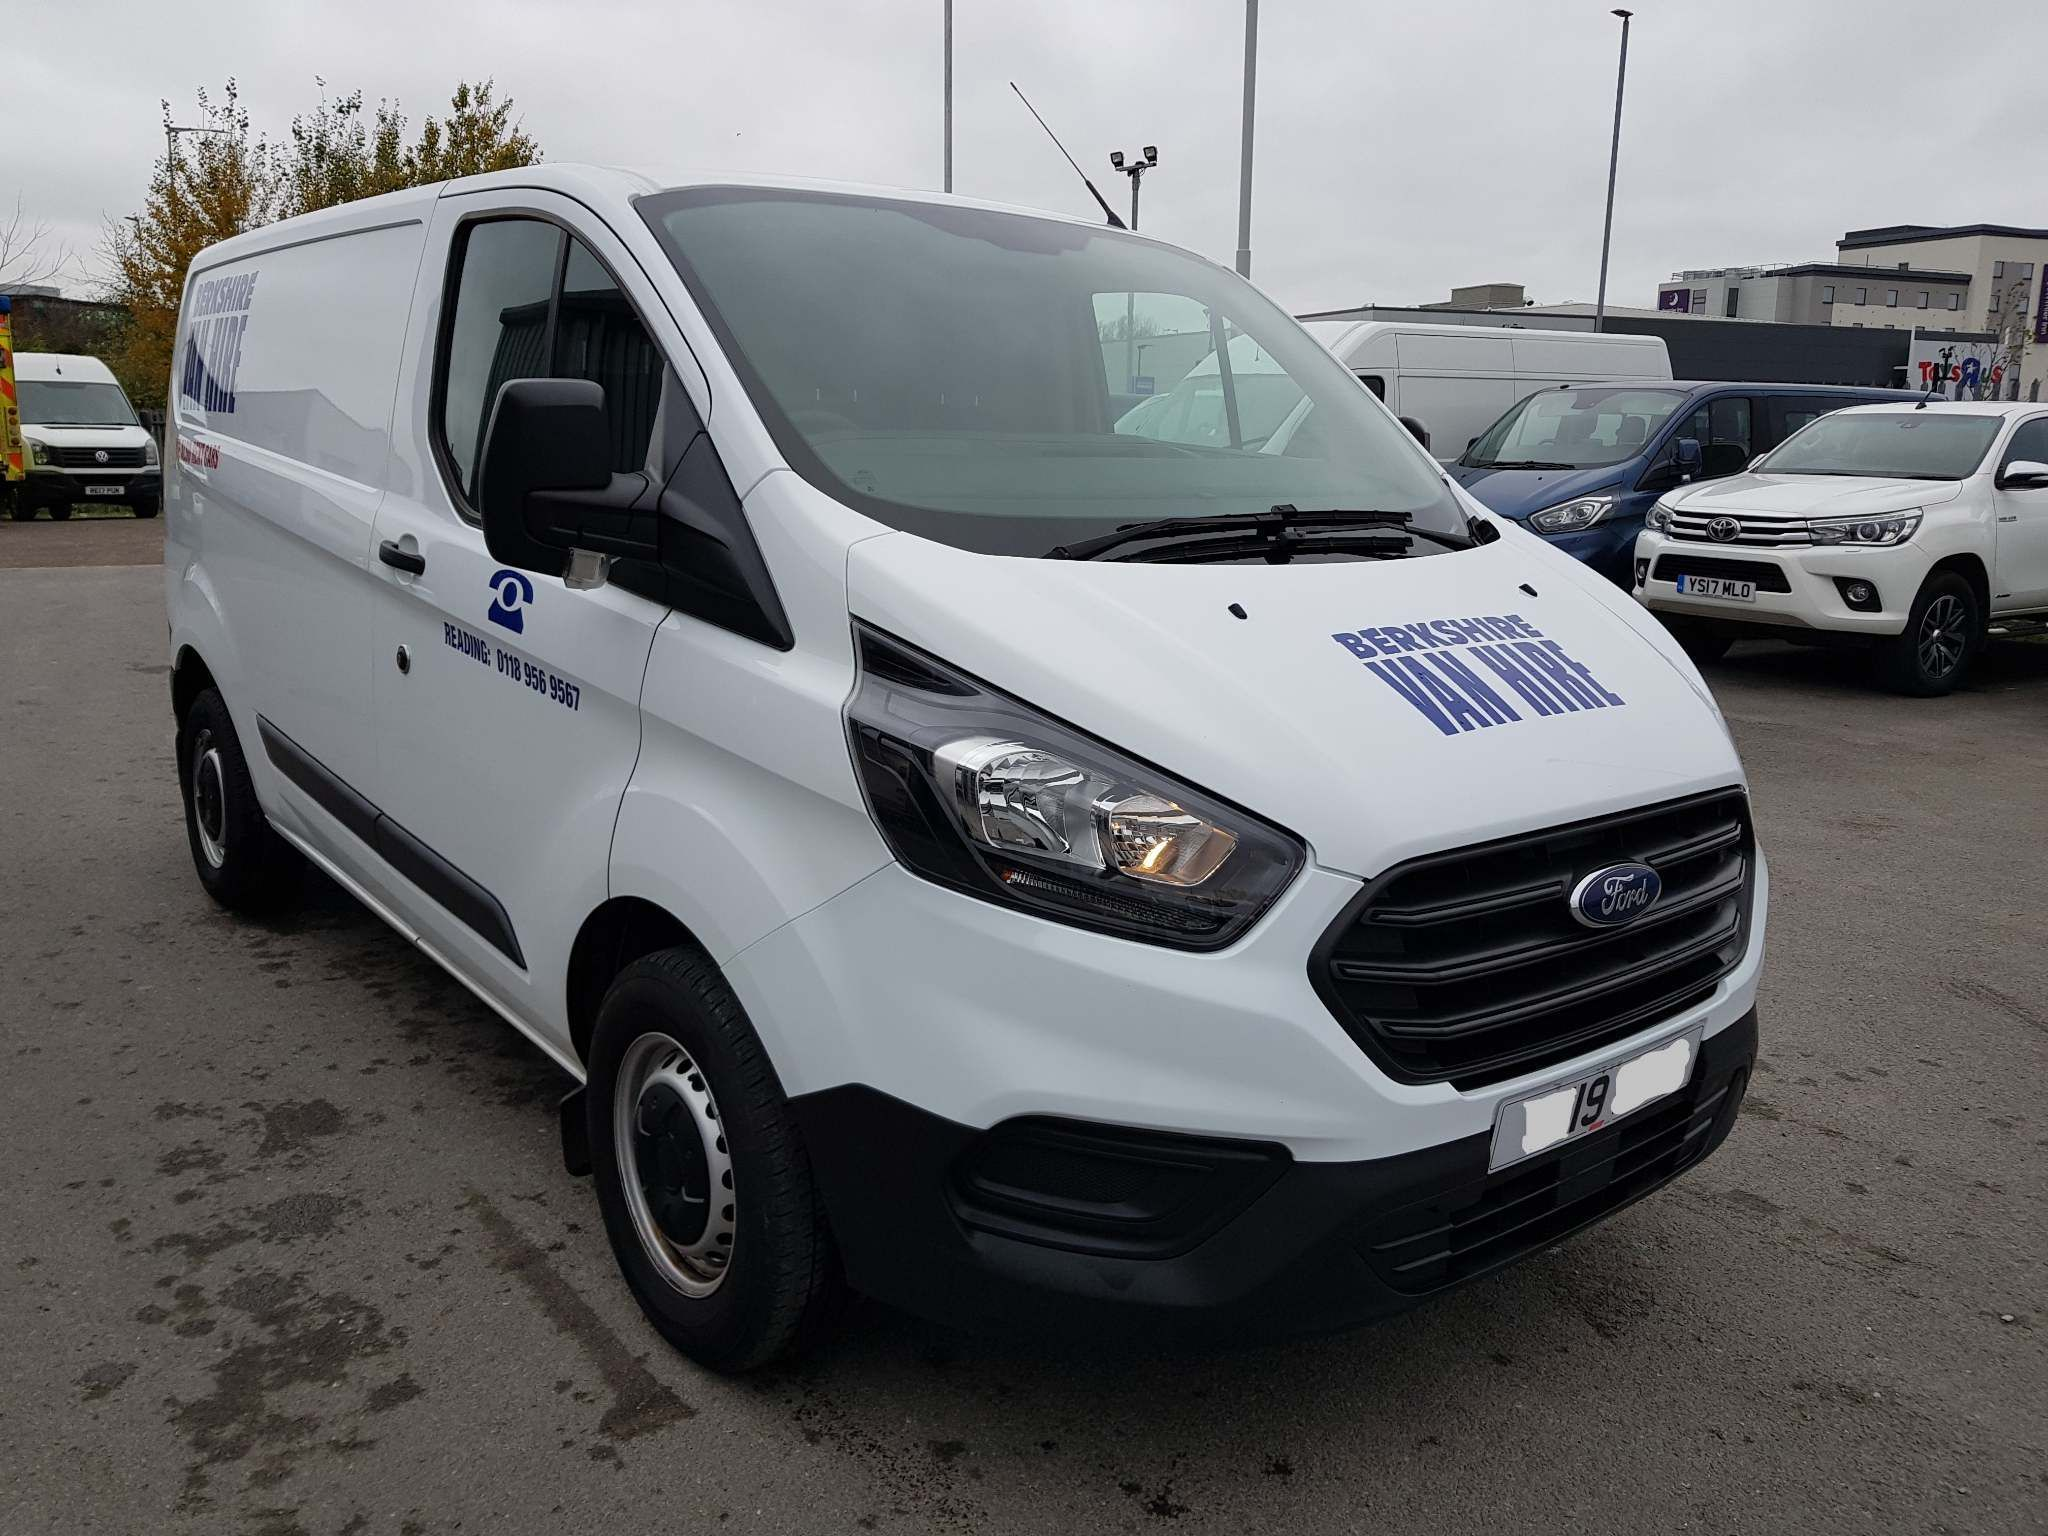 FordTransit Custom2.0 300 EcoBlue Active L1 H1 EU6 5dr For Sale